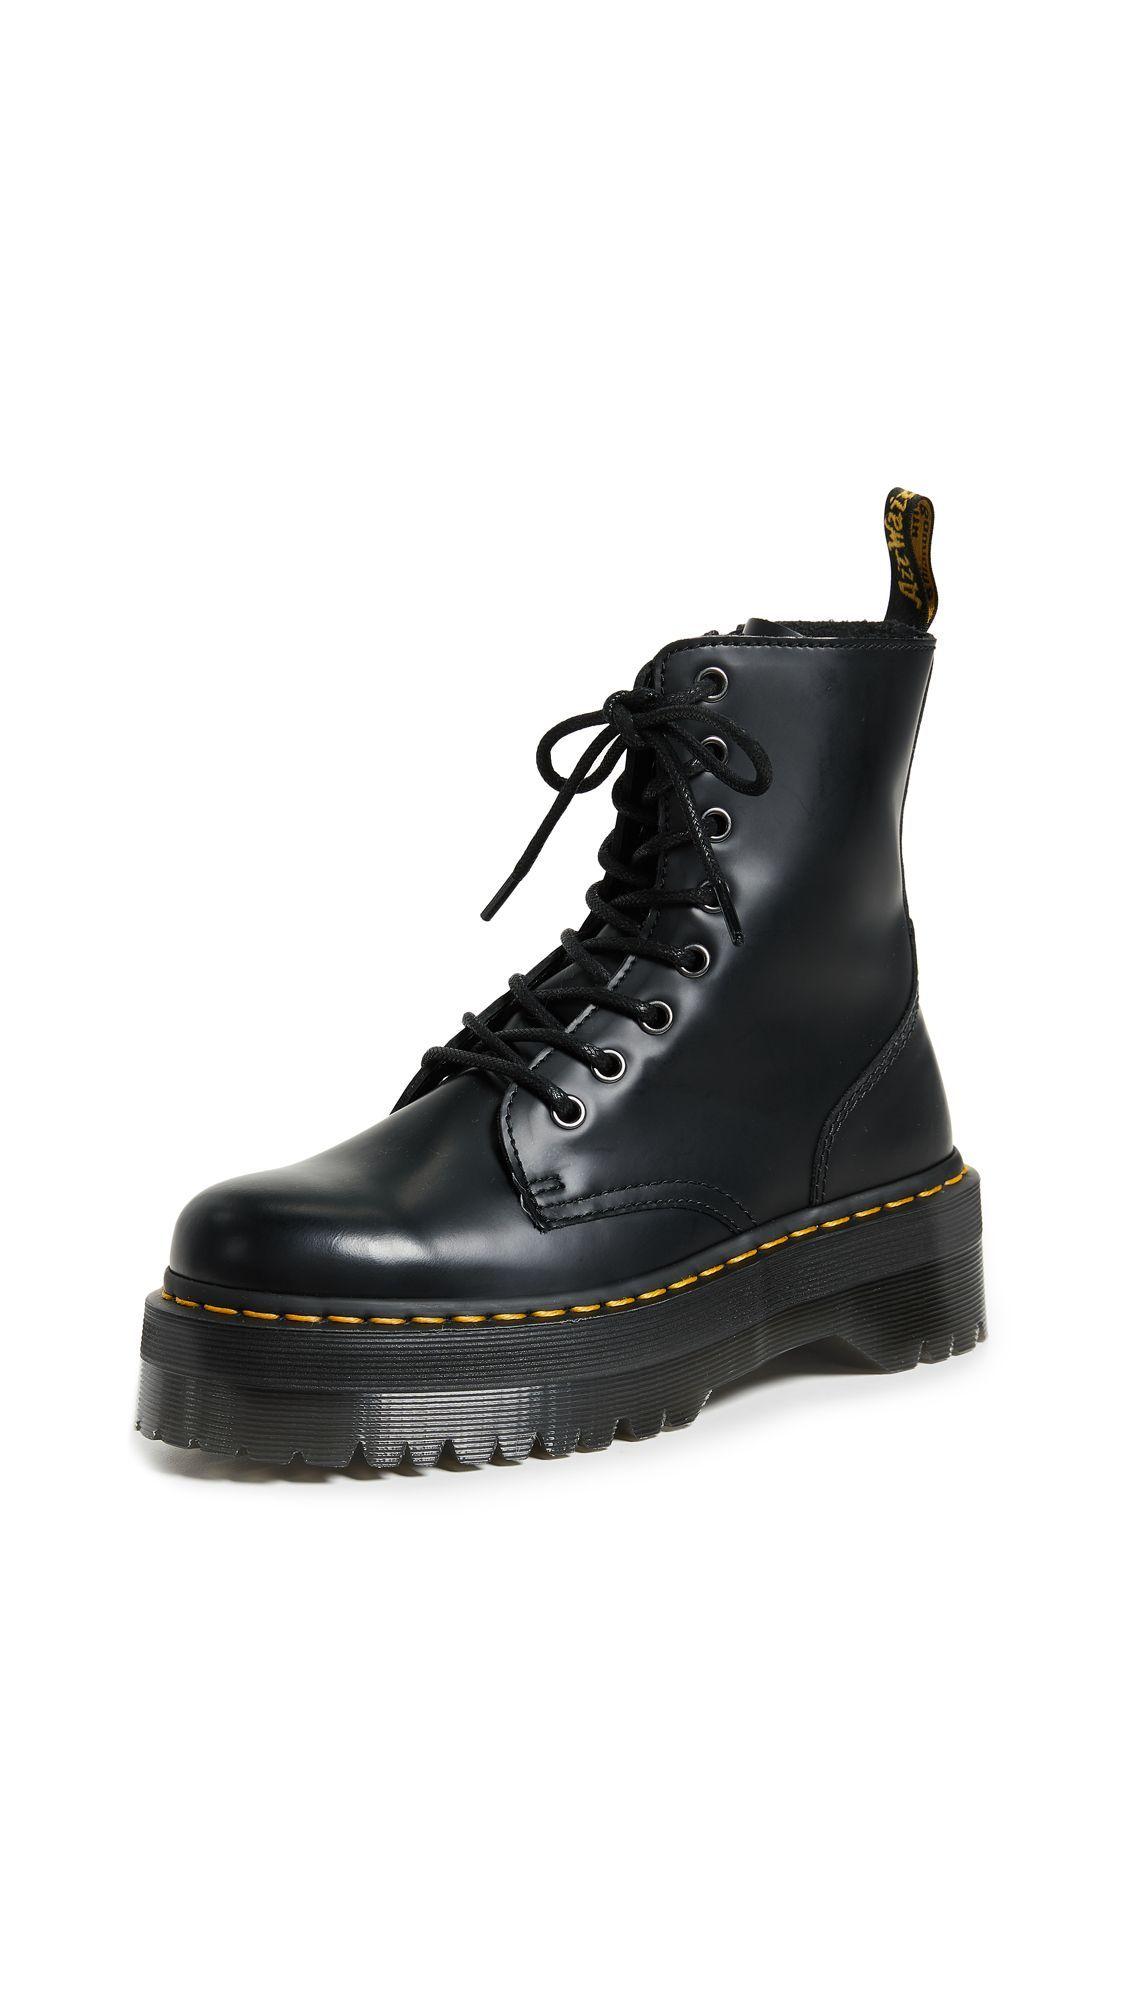 5 Top Winter Boot Trends 2019 Best Winter Boots for Women